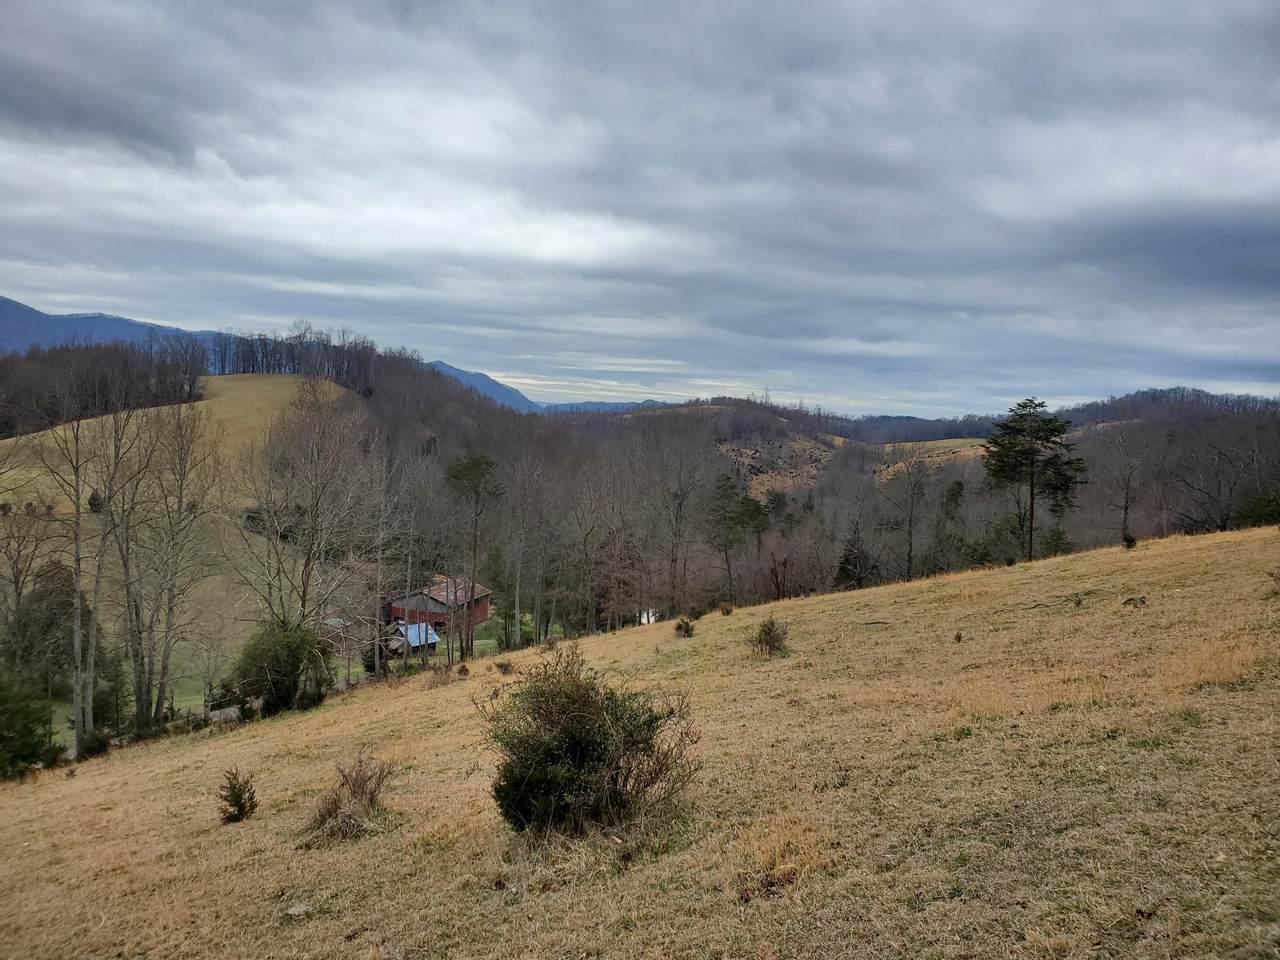 Tbd Mineral Hill Lane - Photo 1